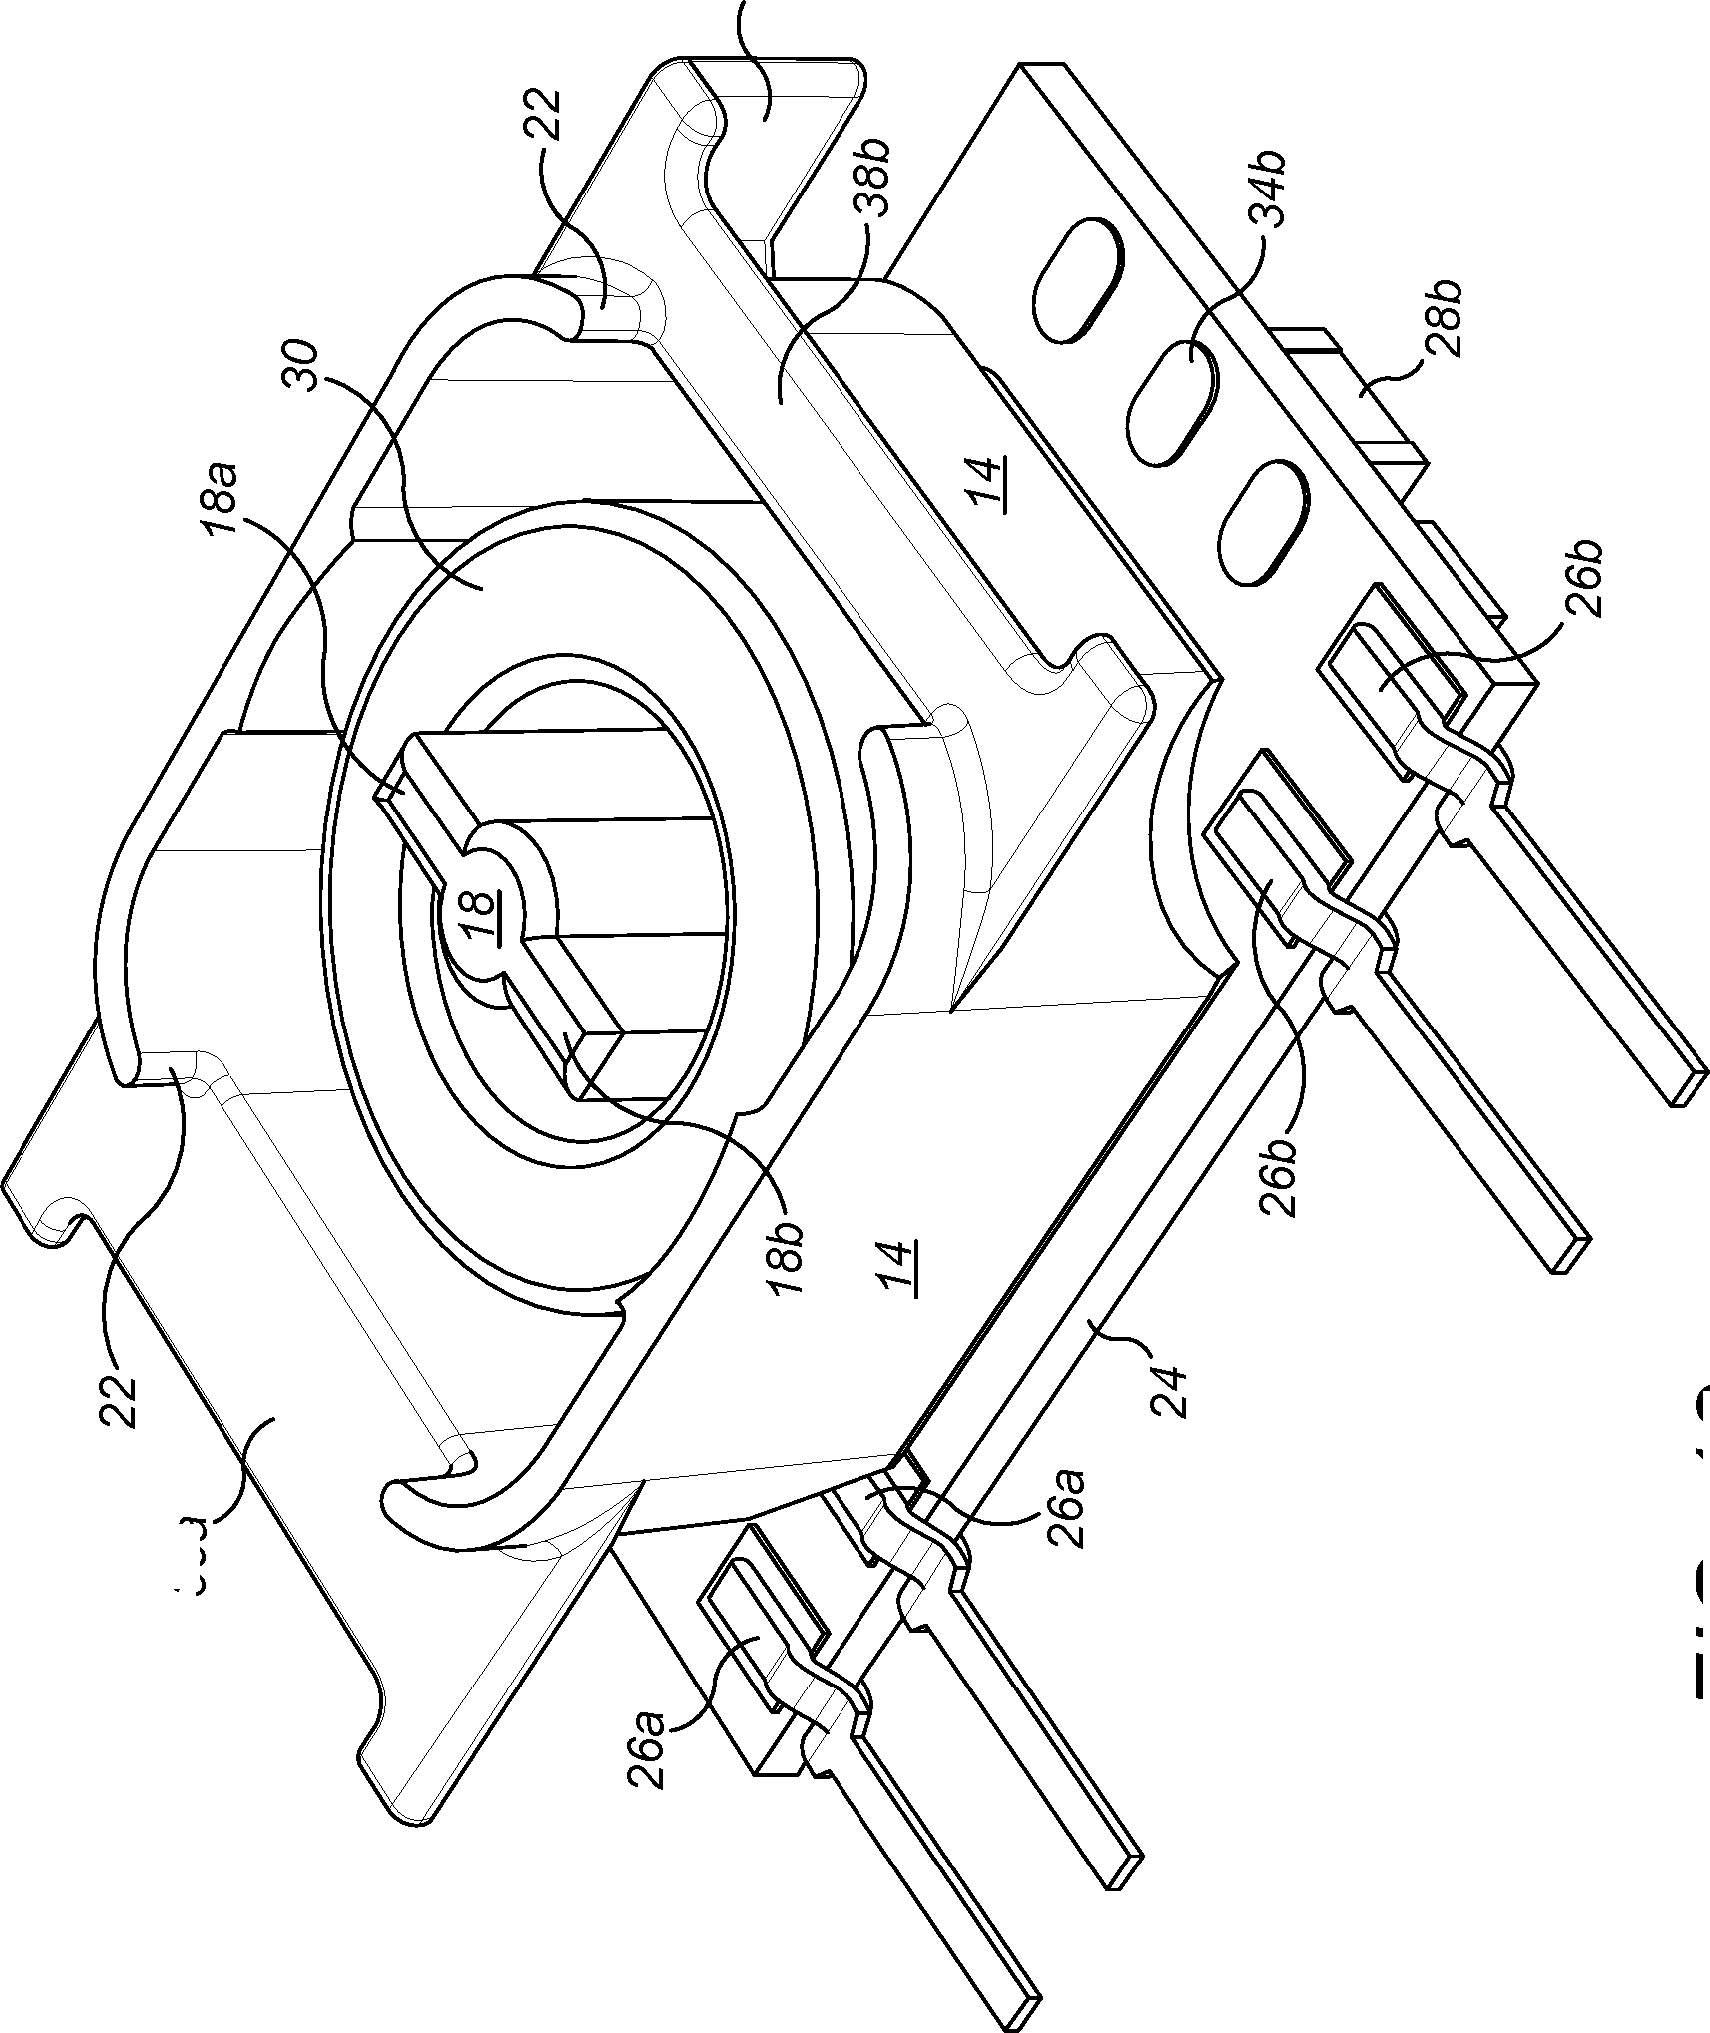 Figure GB2555832A_D0013